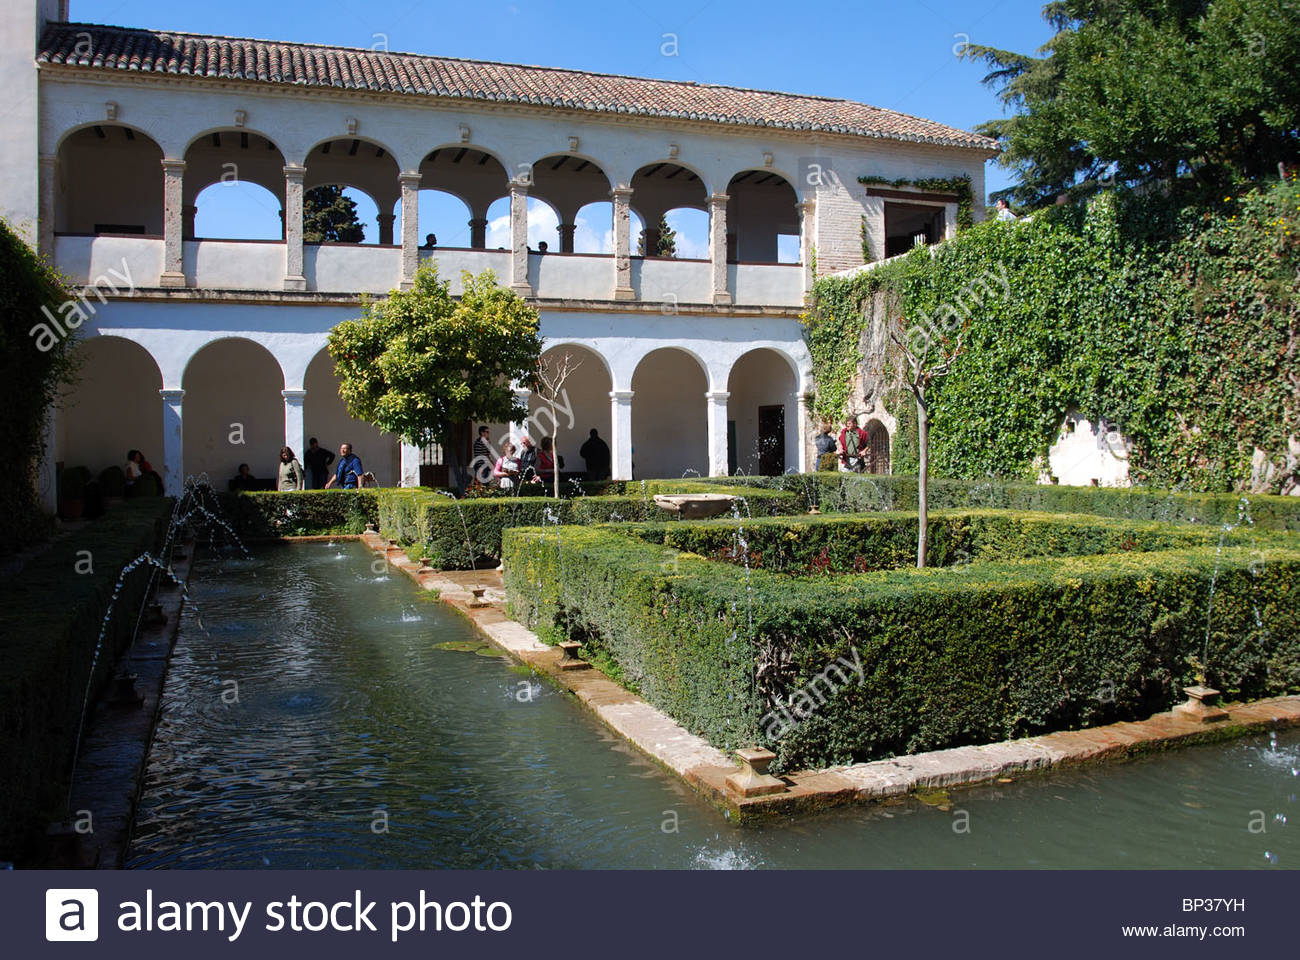 Generalife - Court of the Sultana (Patio de la Sultana), Palace of Alhambra, Granada, Granada Province, Andalucia, - Stock Image